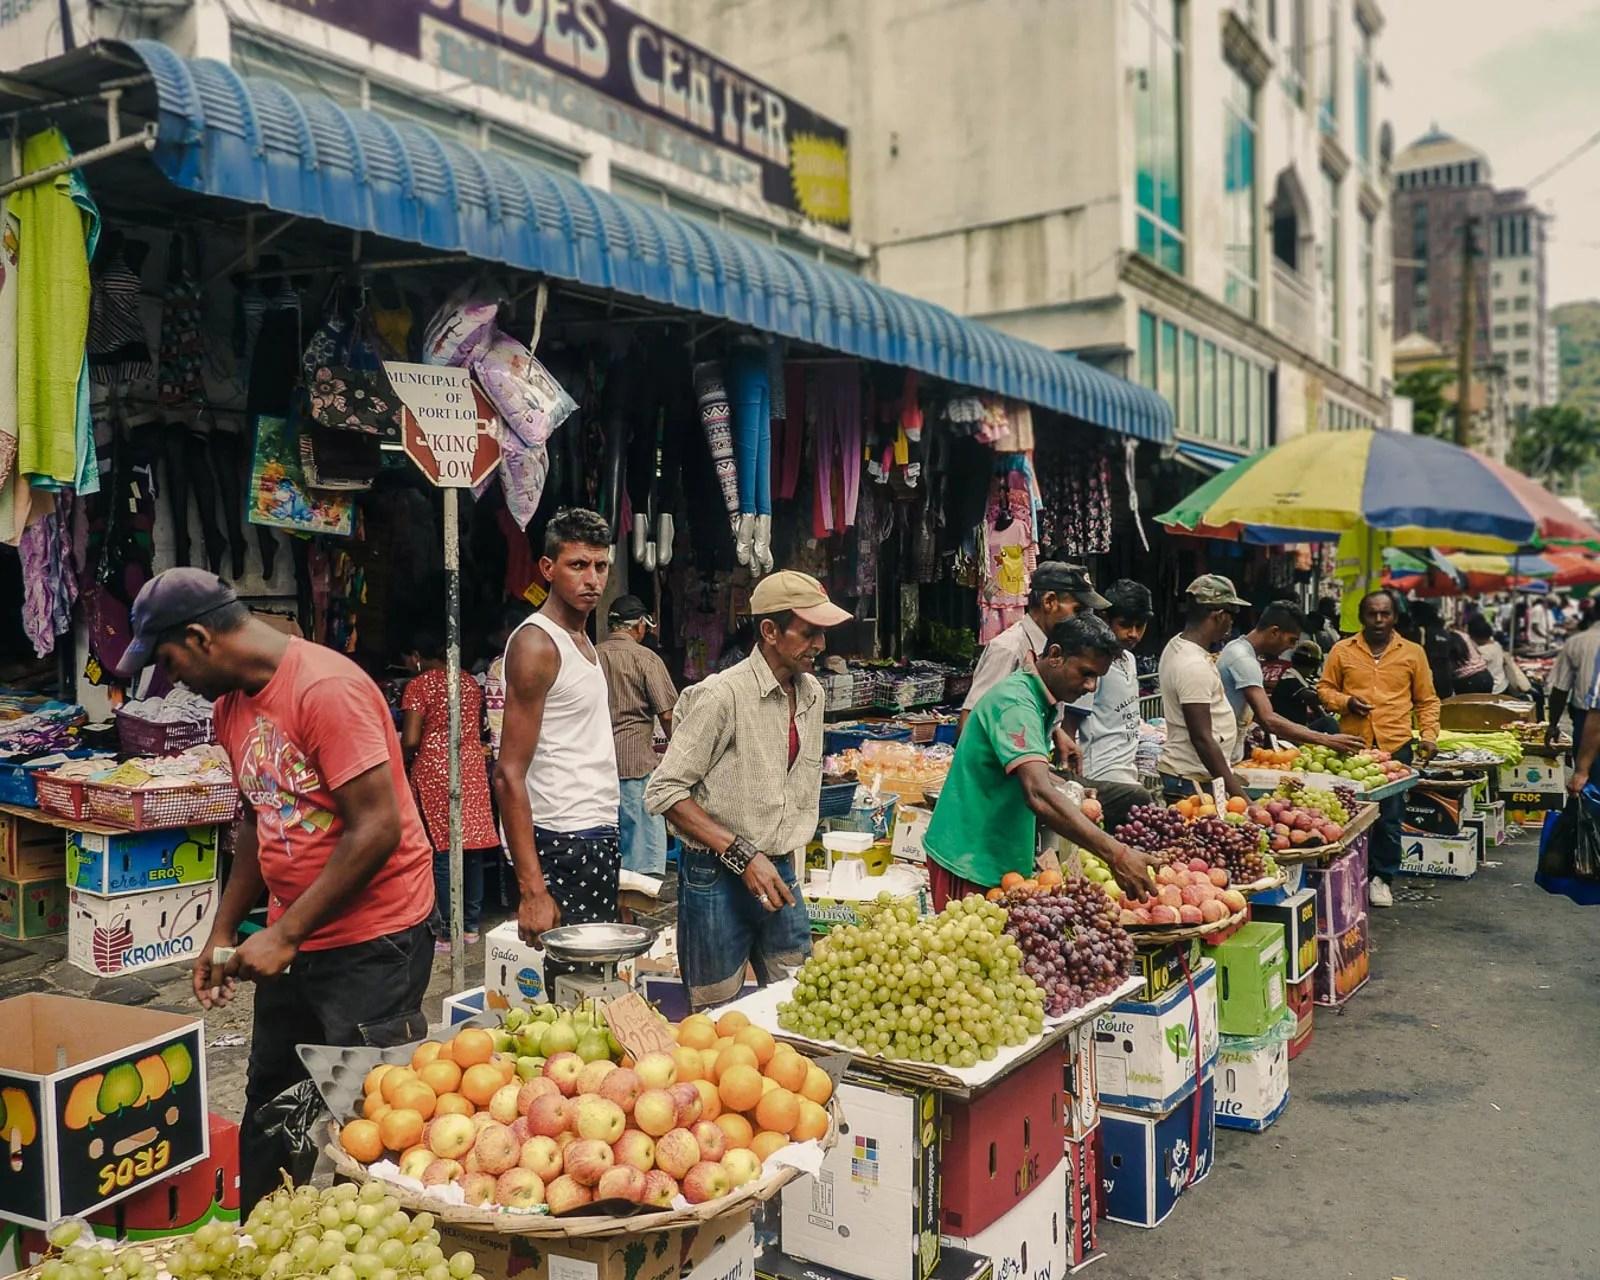 Mauritius market, Port Louis